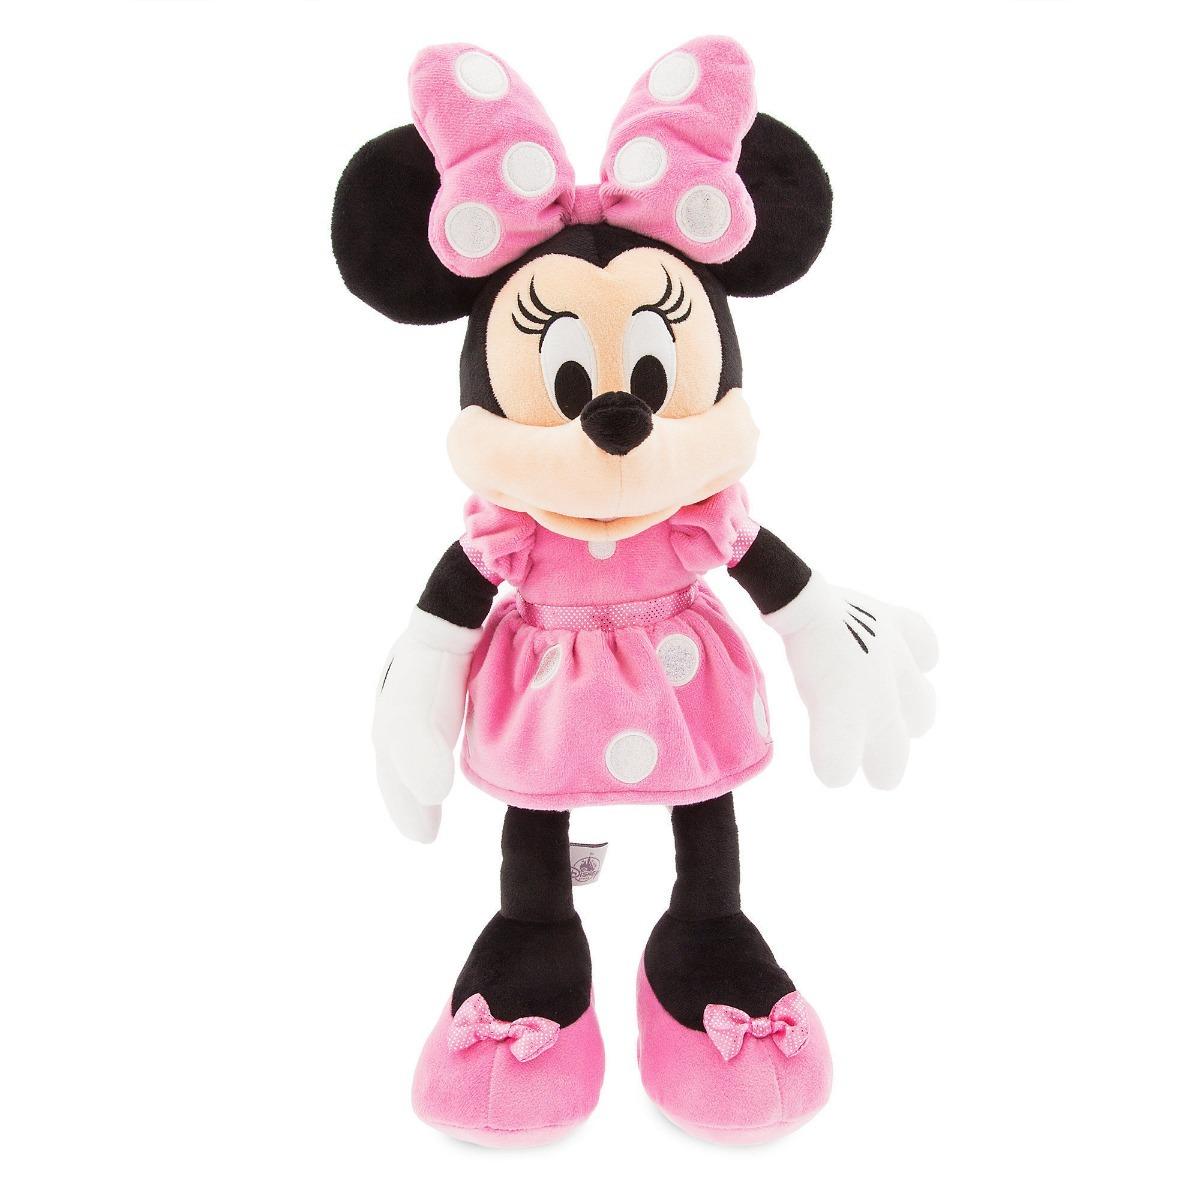 86ad89bb375 Minnie mouse peluche original de disney store cargando zoom jpg 1200x1200  Minnie mouse store